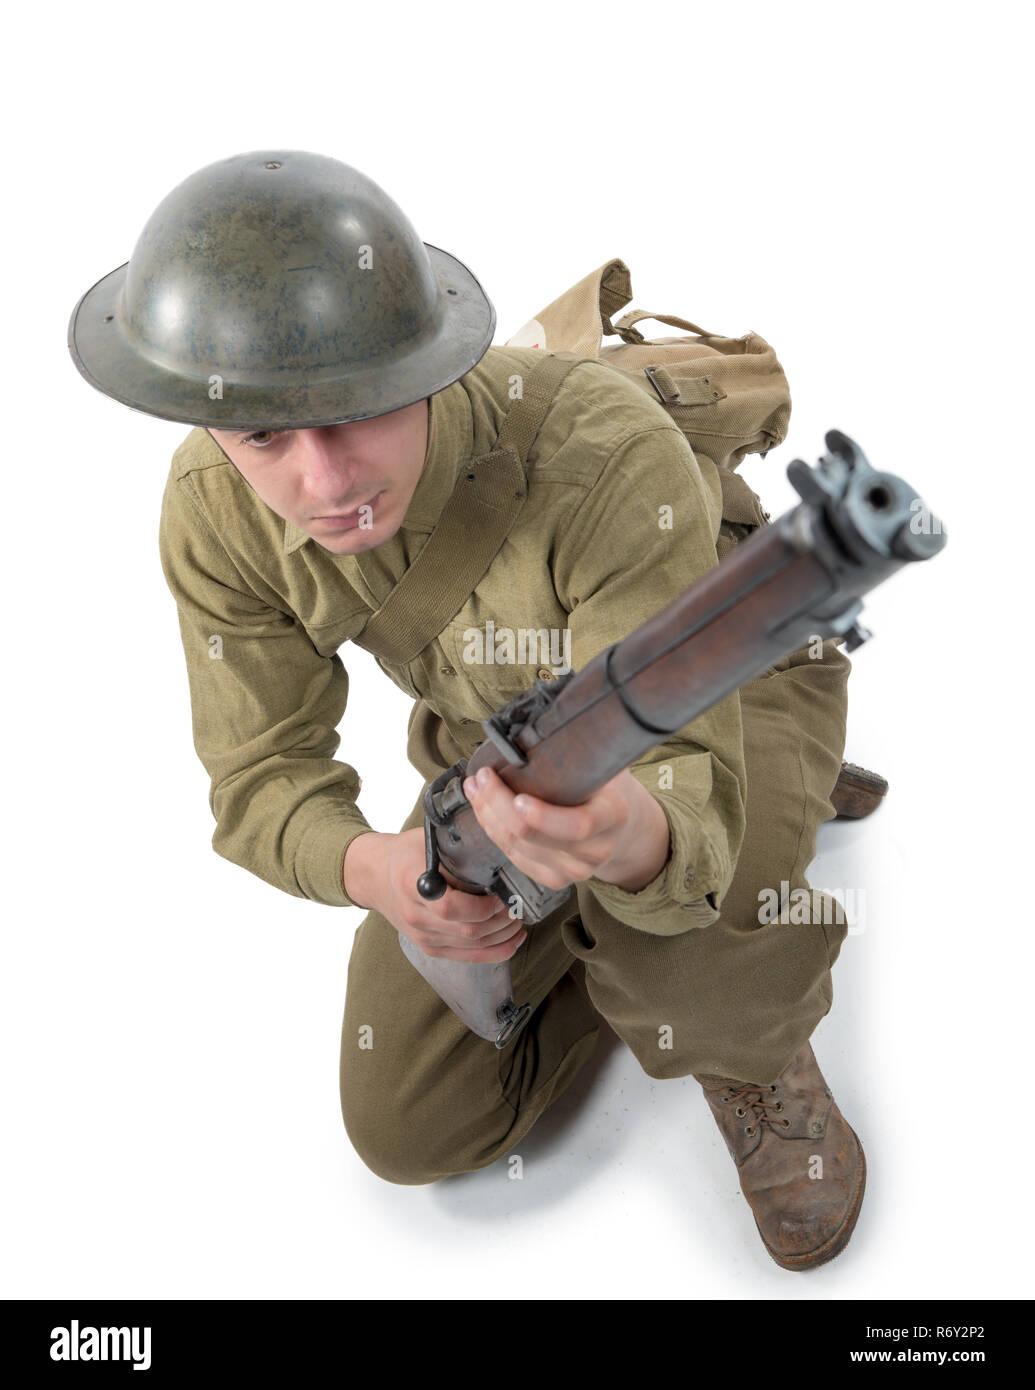 Army Helmet British Stock Photos & Army Helmet British Stock Images